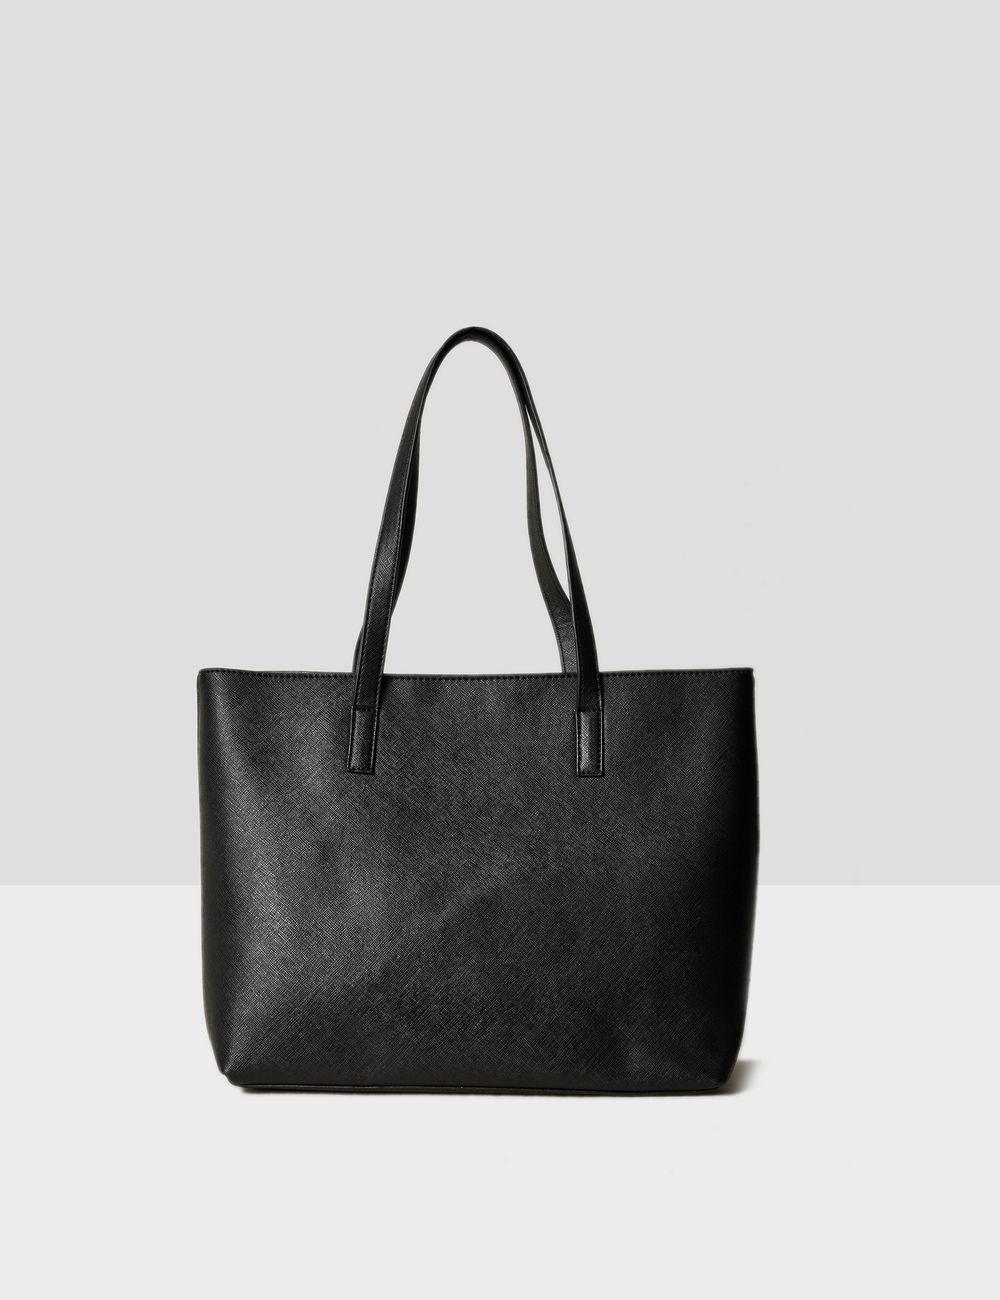 sac cabas noir Jennyfer prix 19,99 €